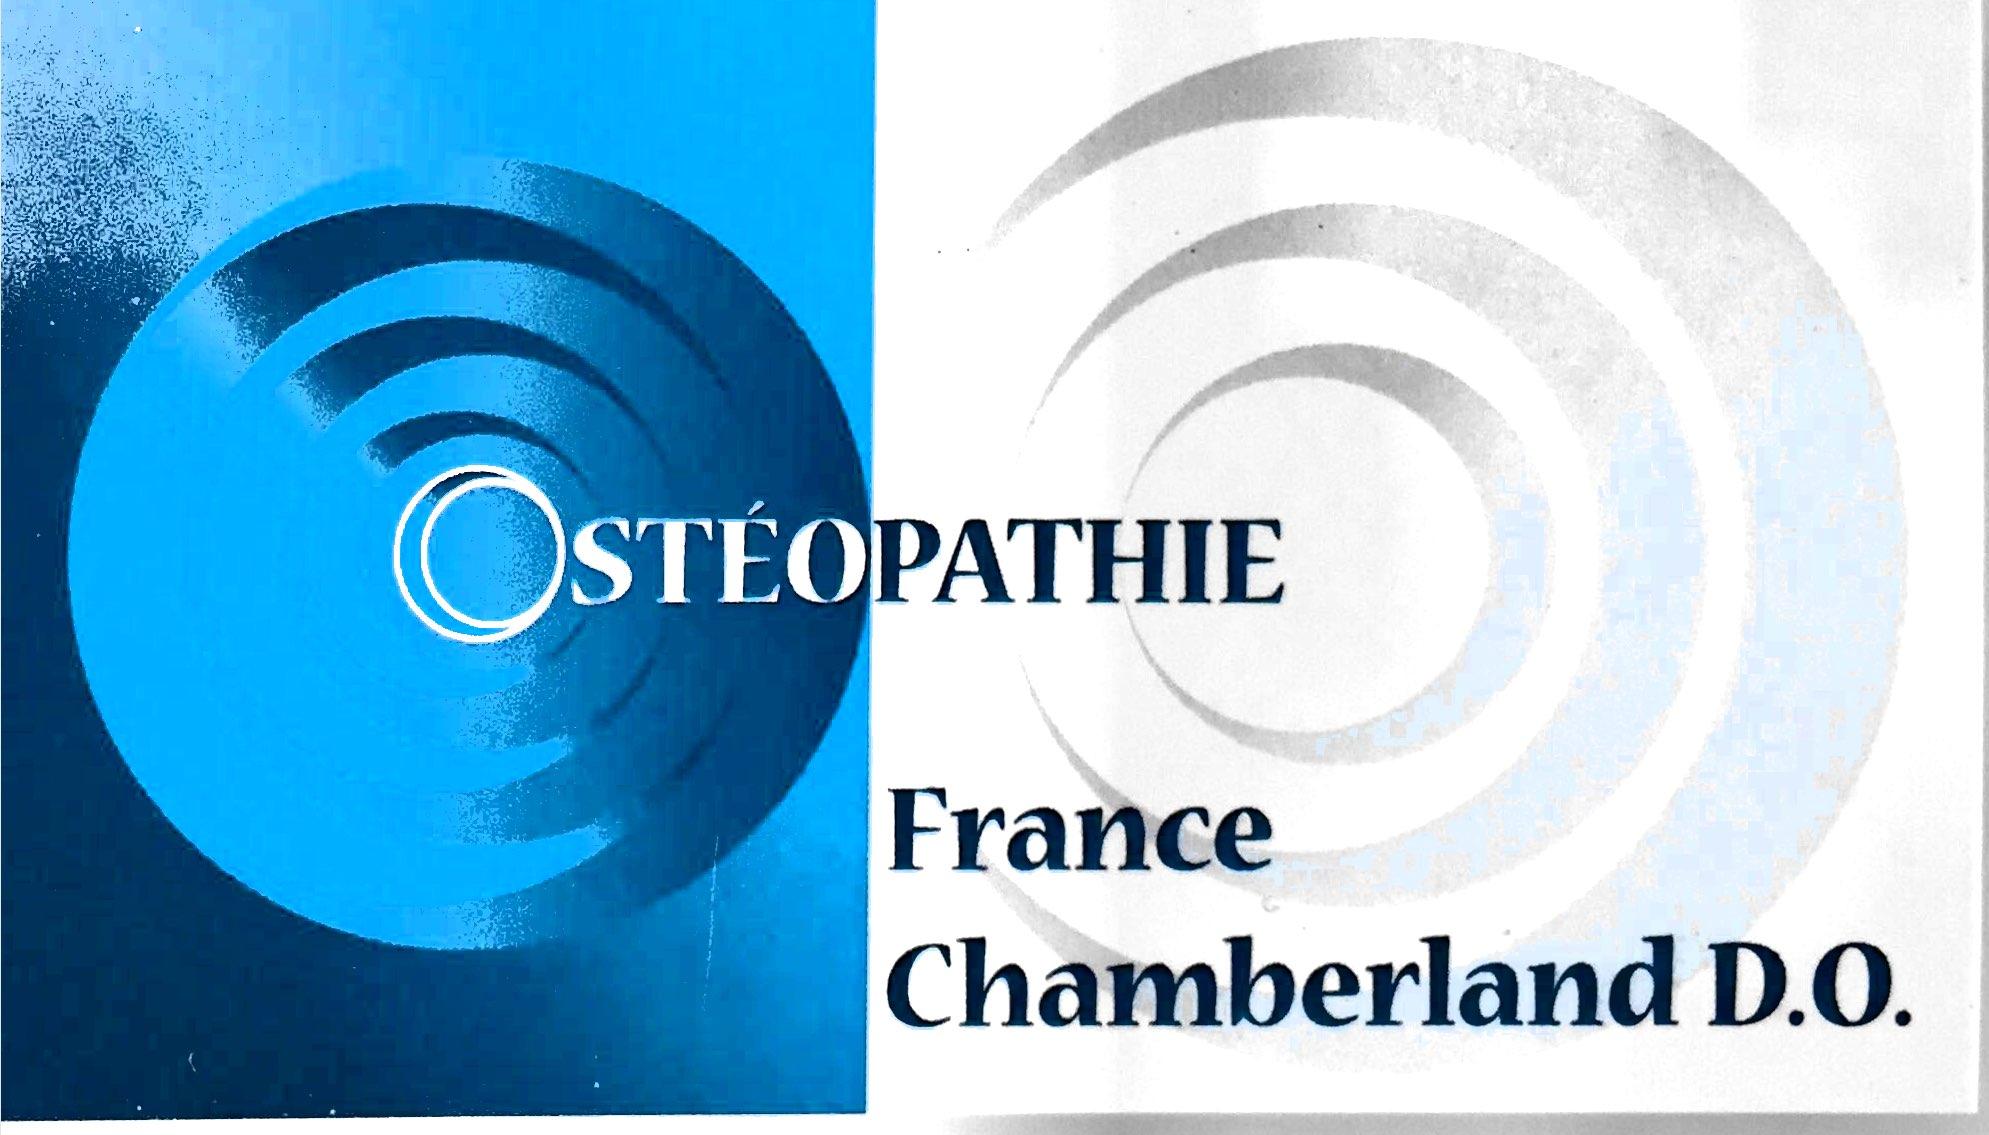 Ostéopathie France Chamberland D.O.